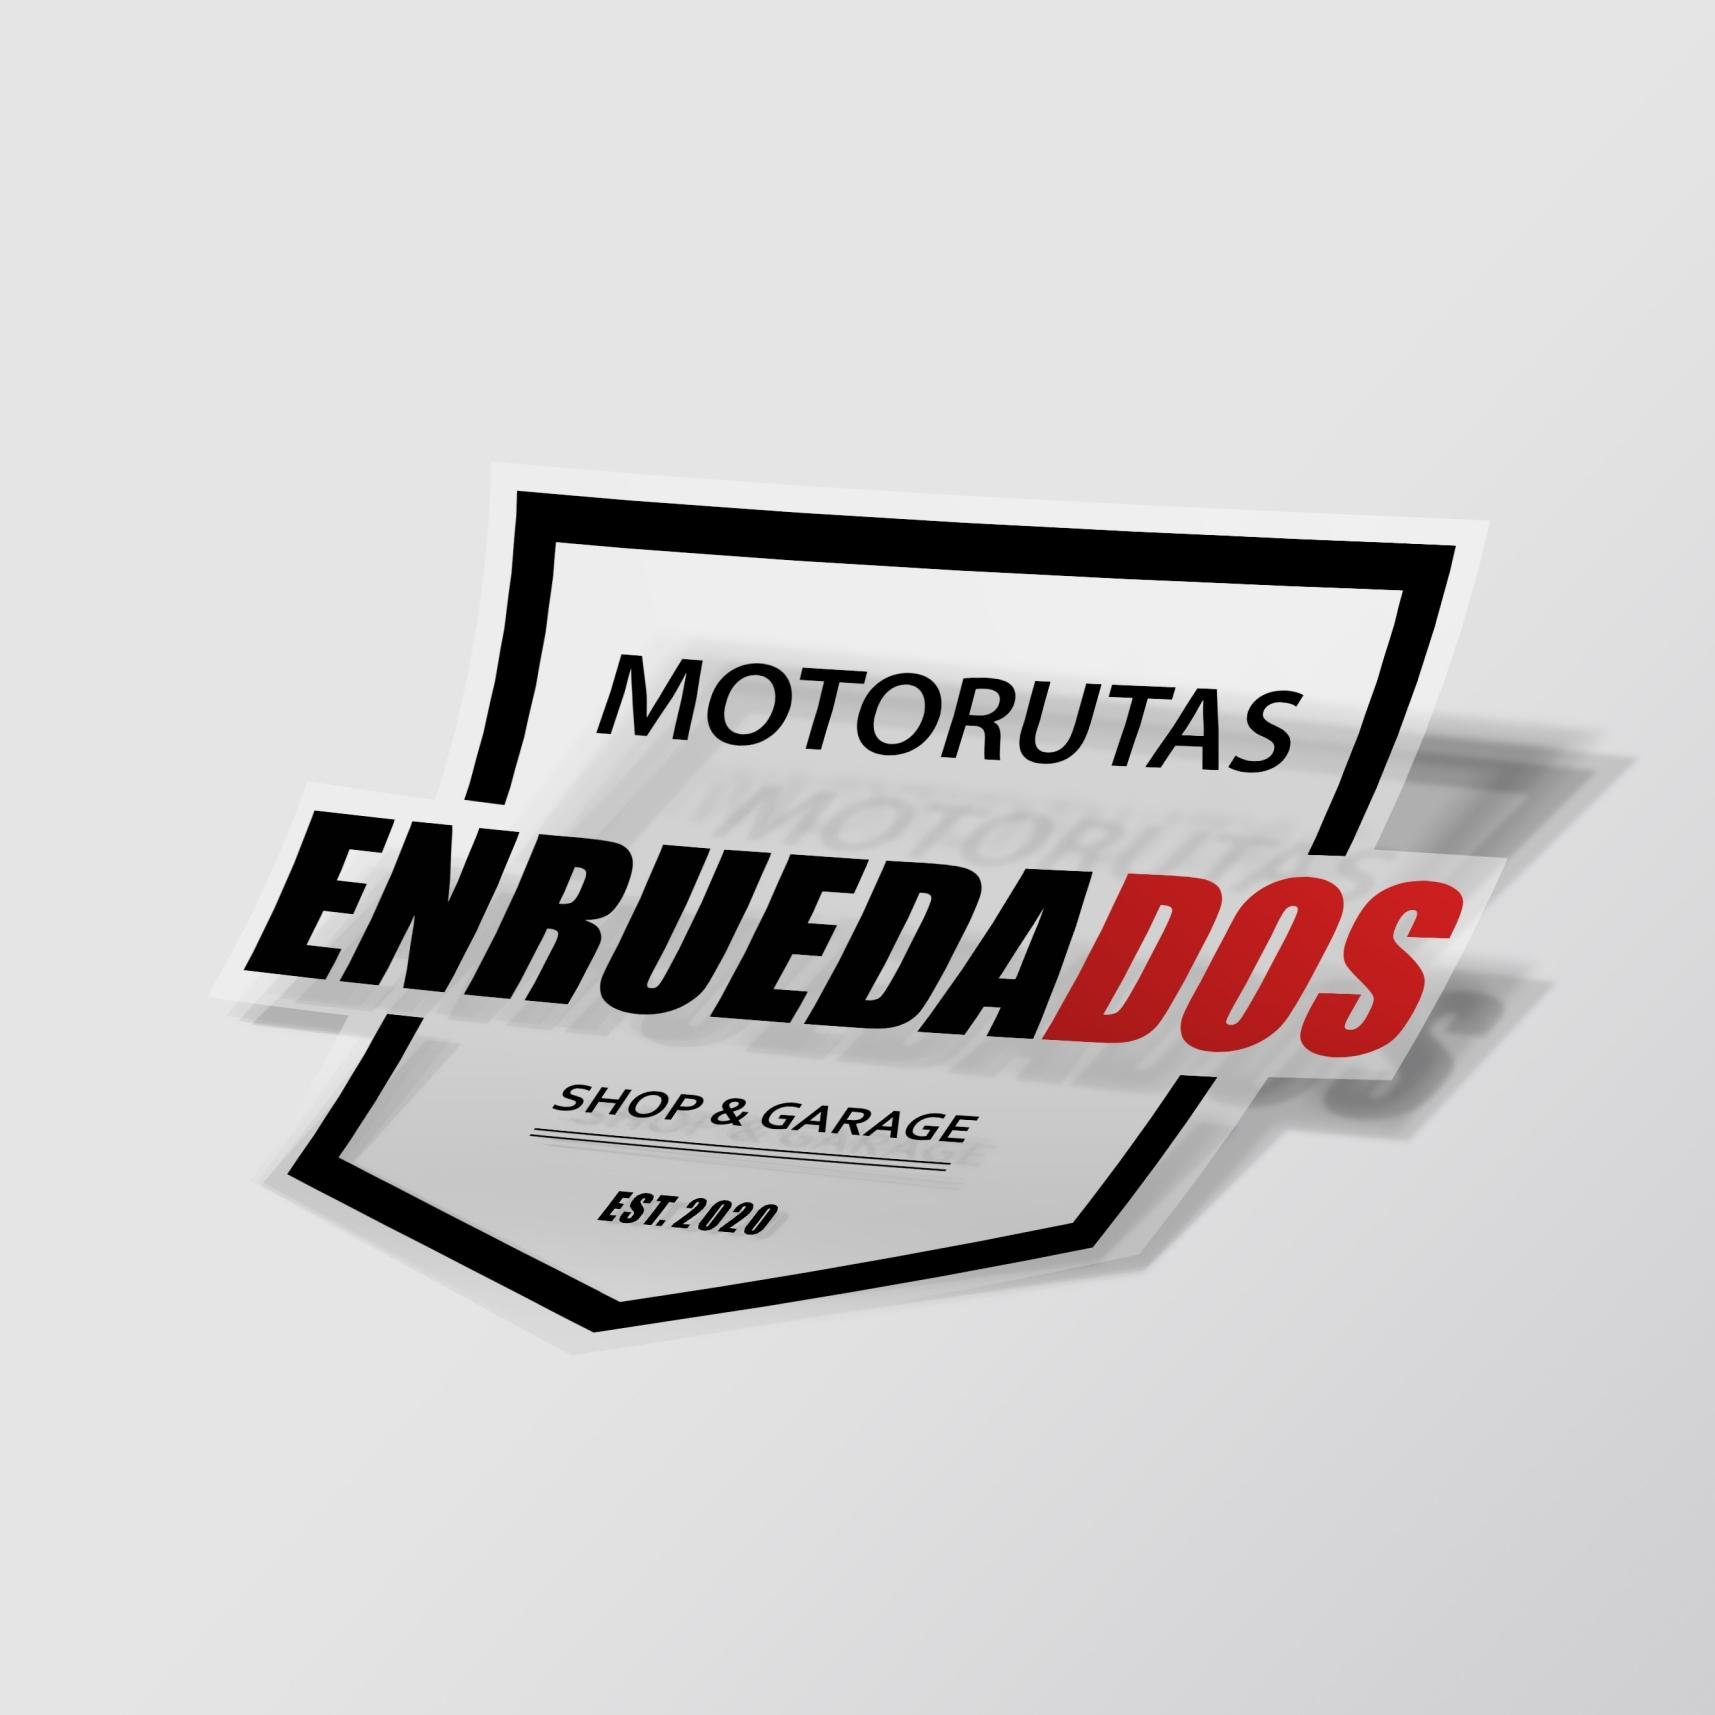 Enruedados-Logo